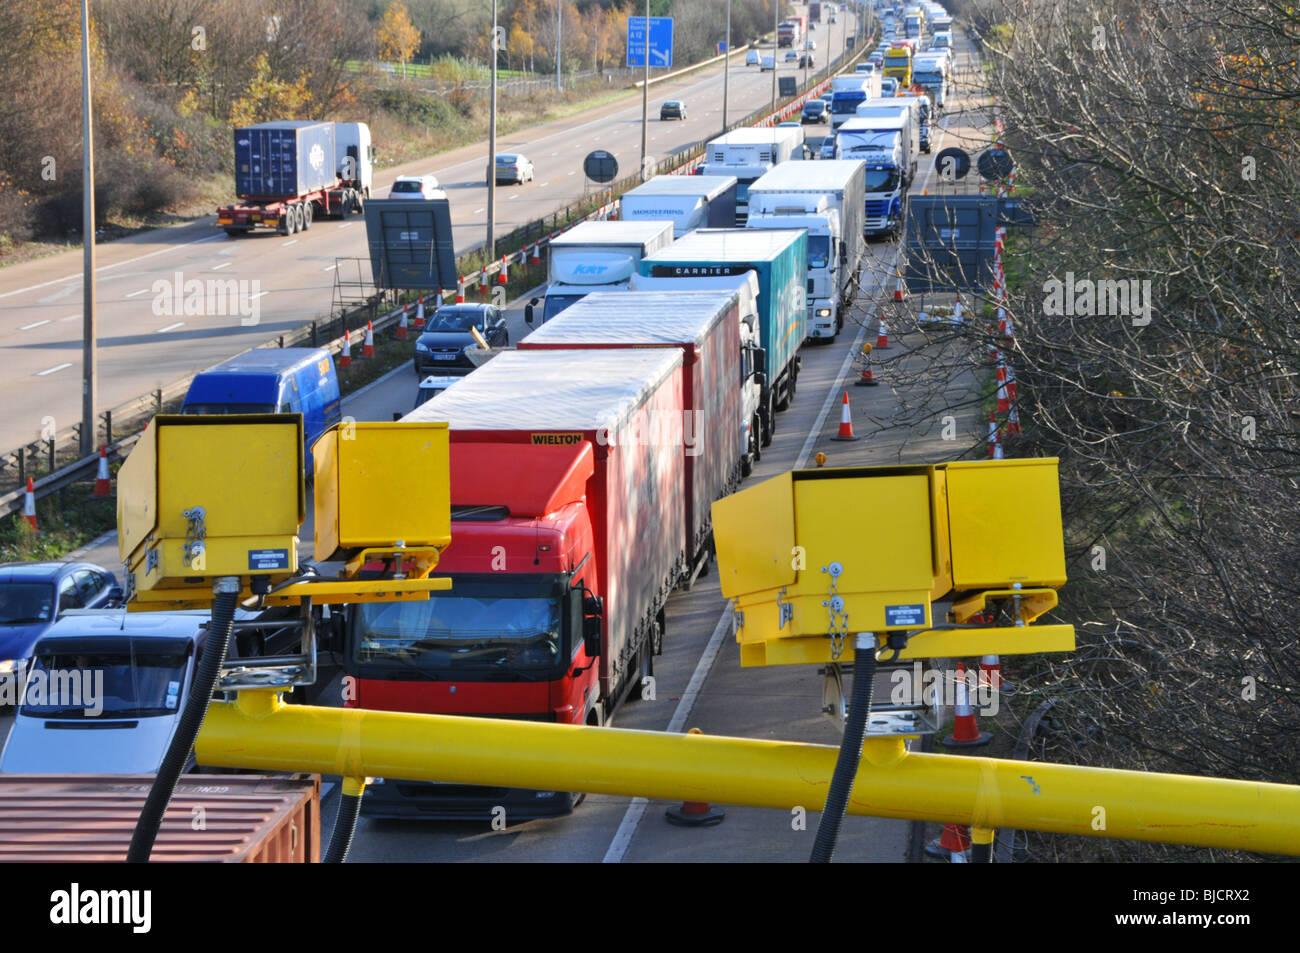 M25 Motorway average speed cameras and traffic jam Stock Photo